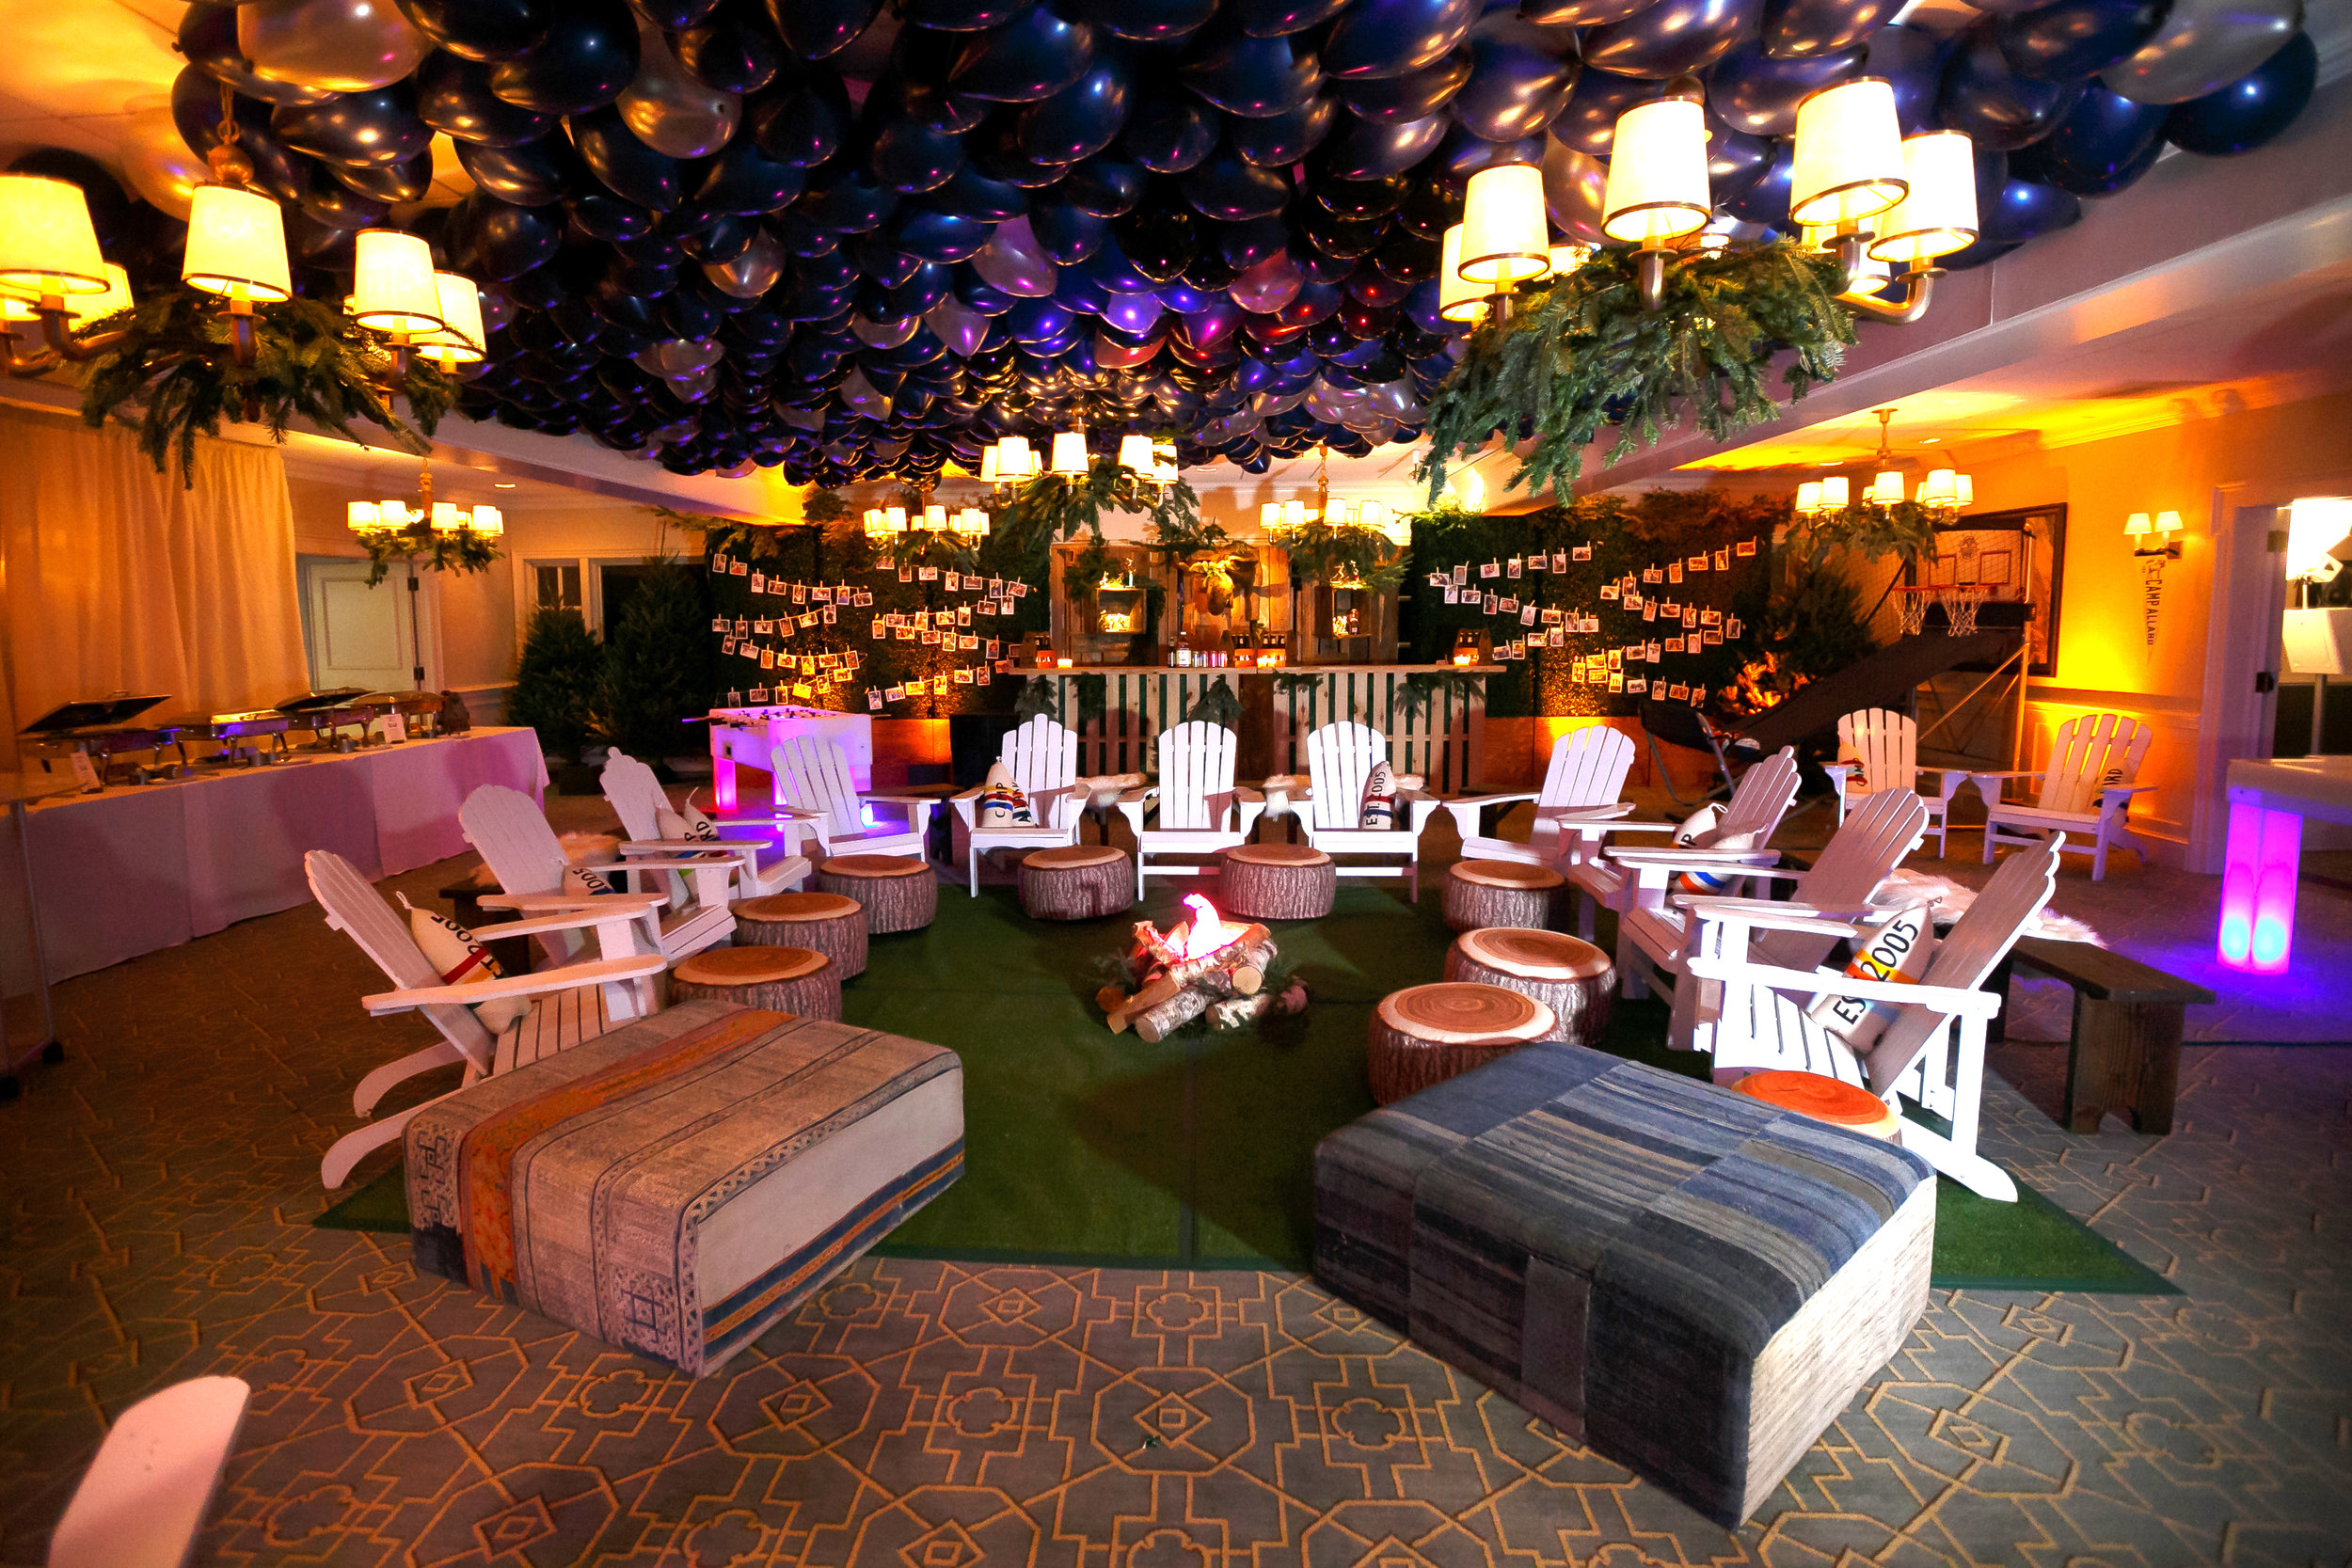 camp themed bar mitzvah - winter